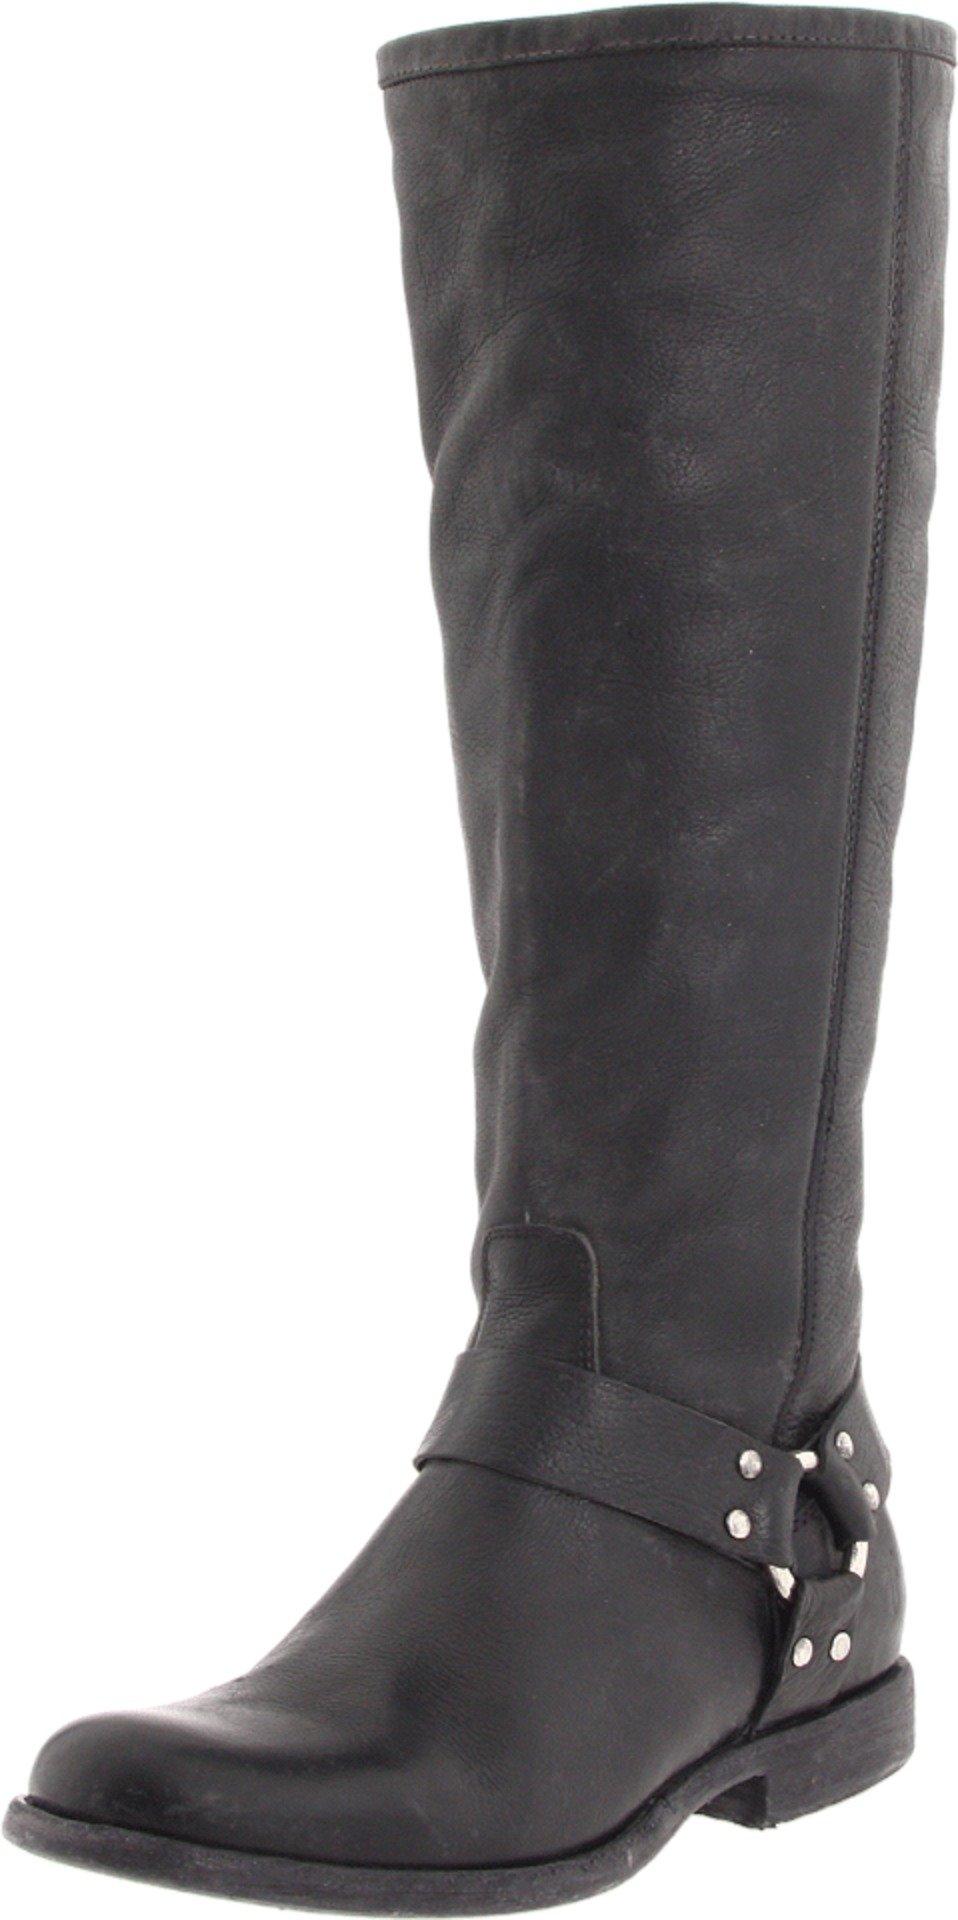 FRYE Women's Phillip Harness Tall medium calf Boot, Black Soft Vintage Leather, 6.5 M US